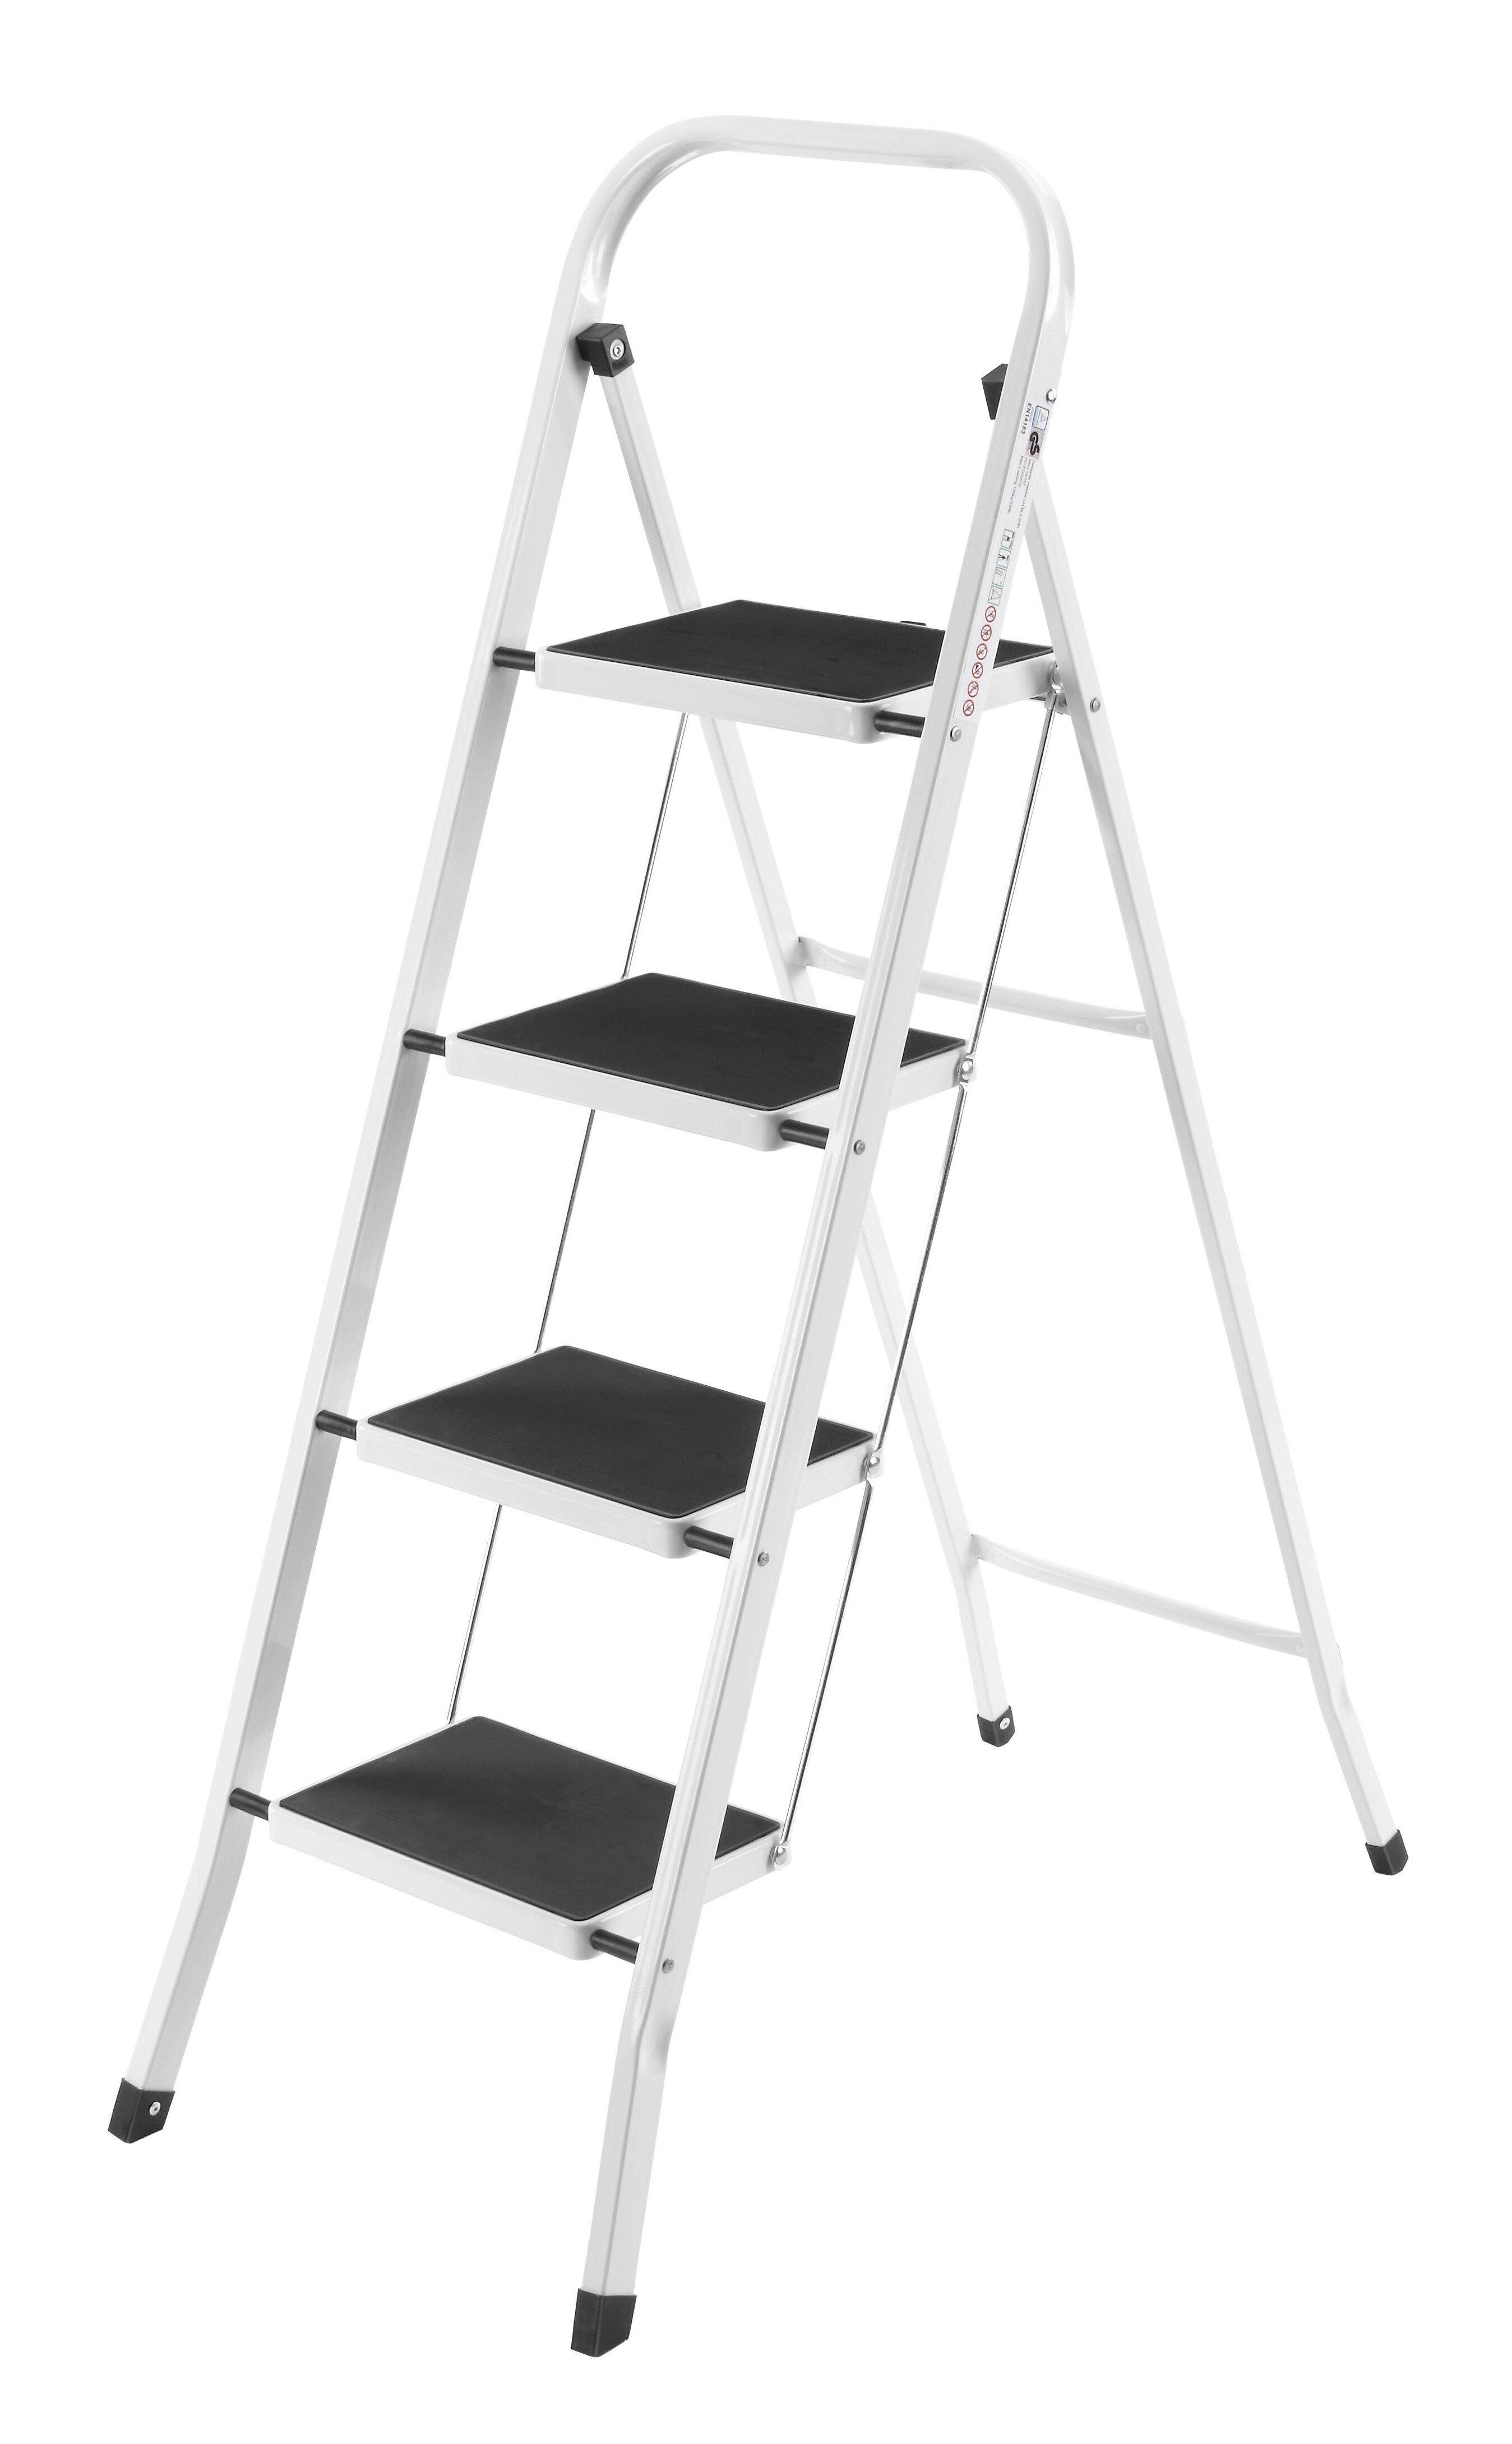 Phenomenal 4 16 Ft Steel Step Ladder Camellatalisay Diy Chair Ideas Camellatalisaycom